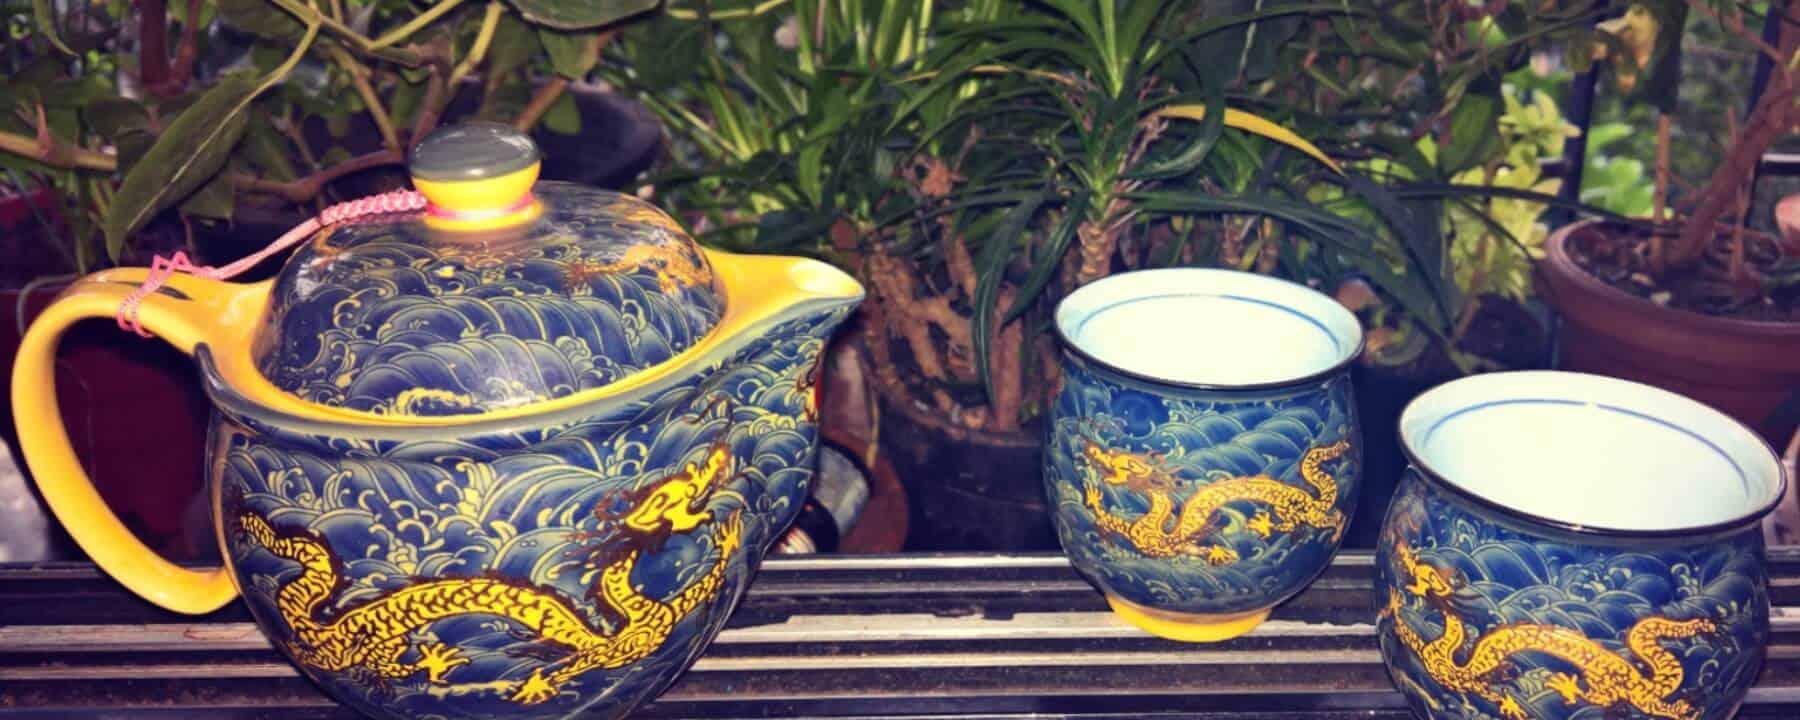 A tea pot and two tea cups